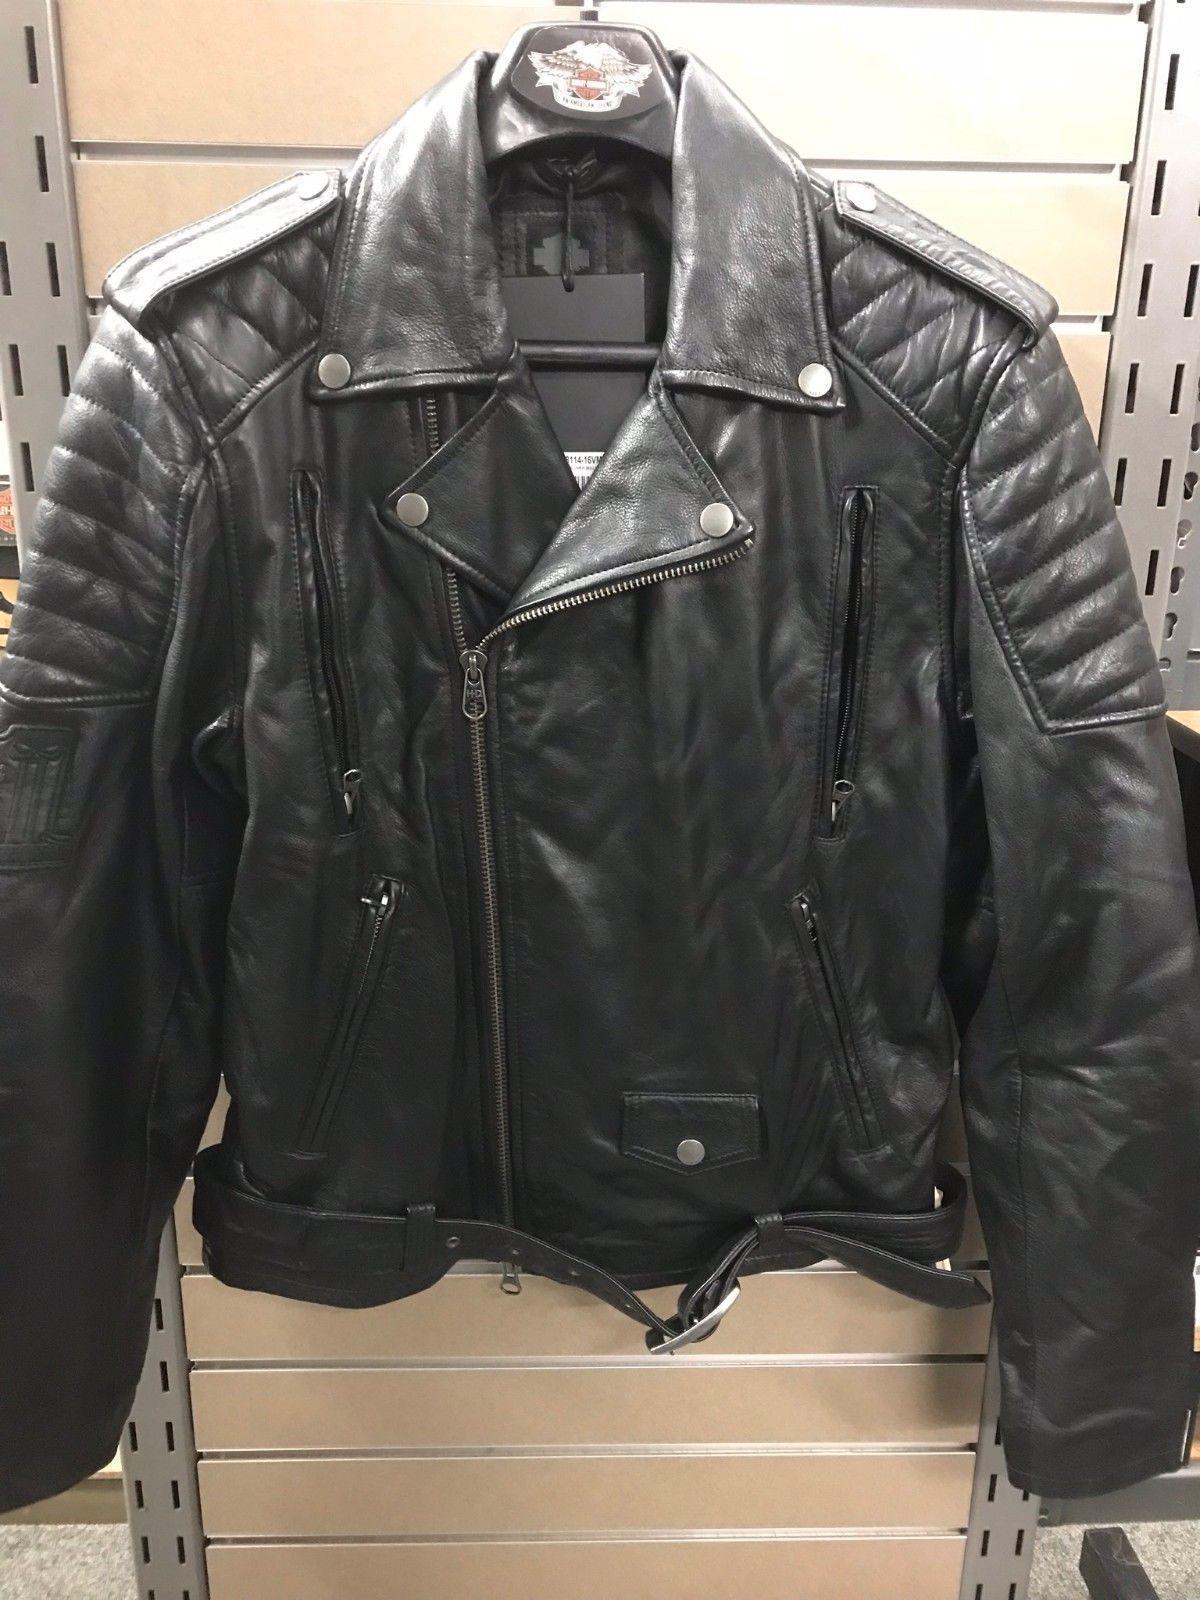 Harley Davidson Mens Black Label Core 1 Skull Leather Biker Jacket Jaket Kulit Pria David 98114 16vm Item Specifics Condition New With Tags A Brand Unused And Unworn